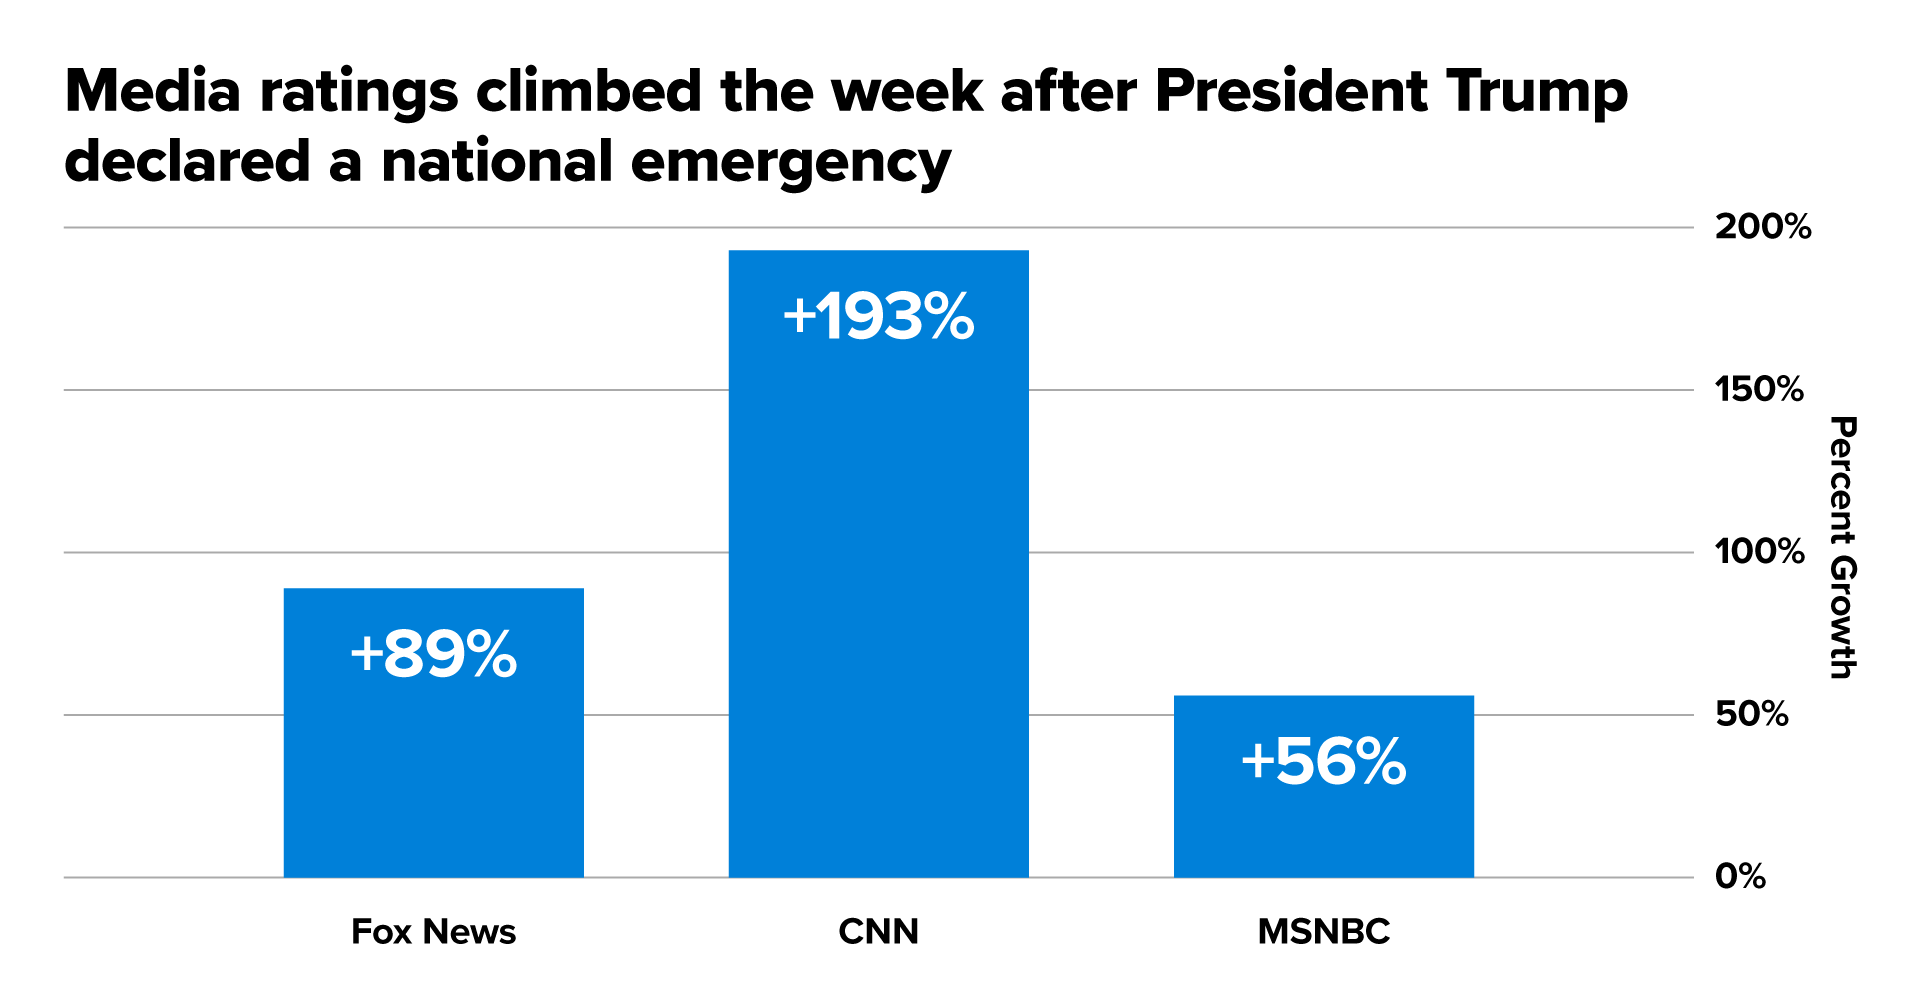 Media climbing